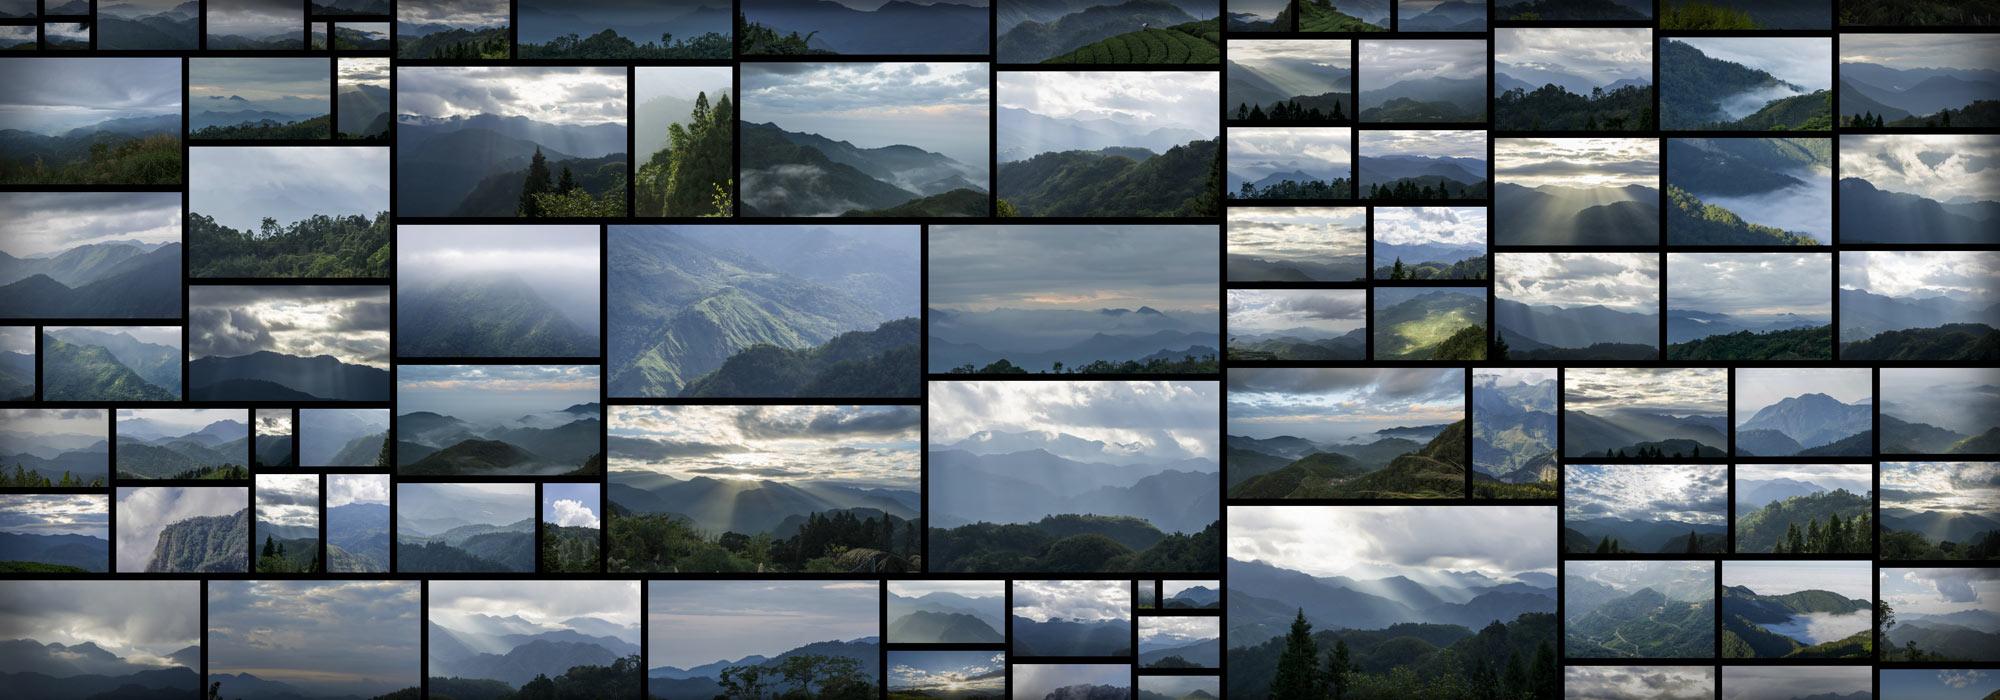 Alishan_Mountains_QuickLook.jpg